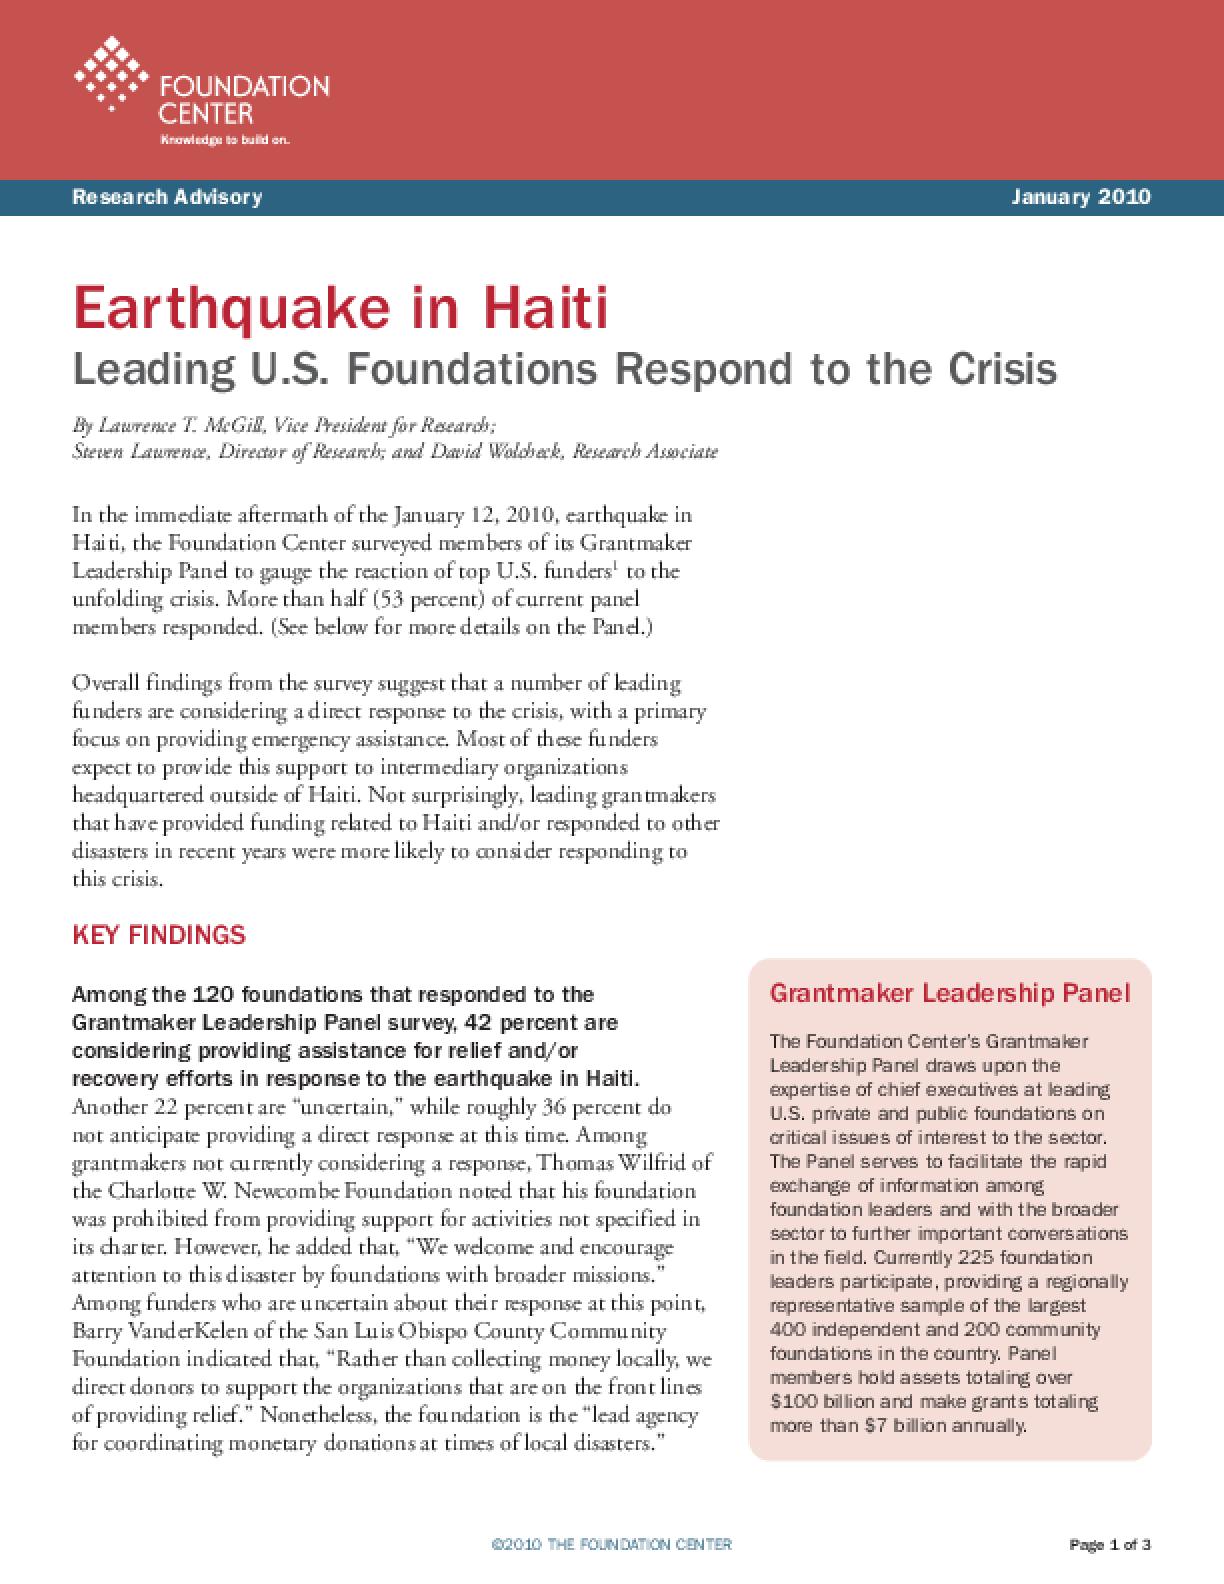 Earthquake in Haiti: Leading U.S. Foundations Respond to the Crisis